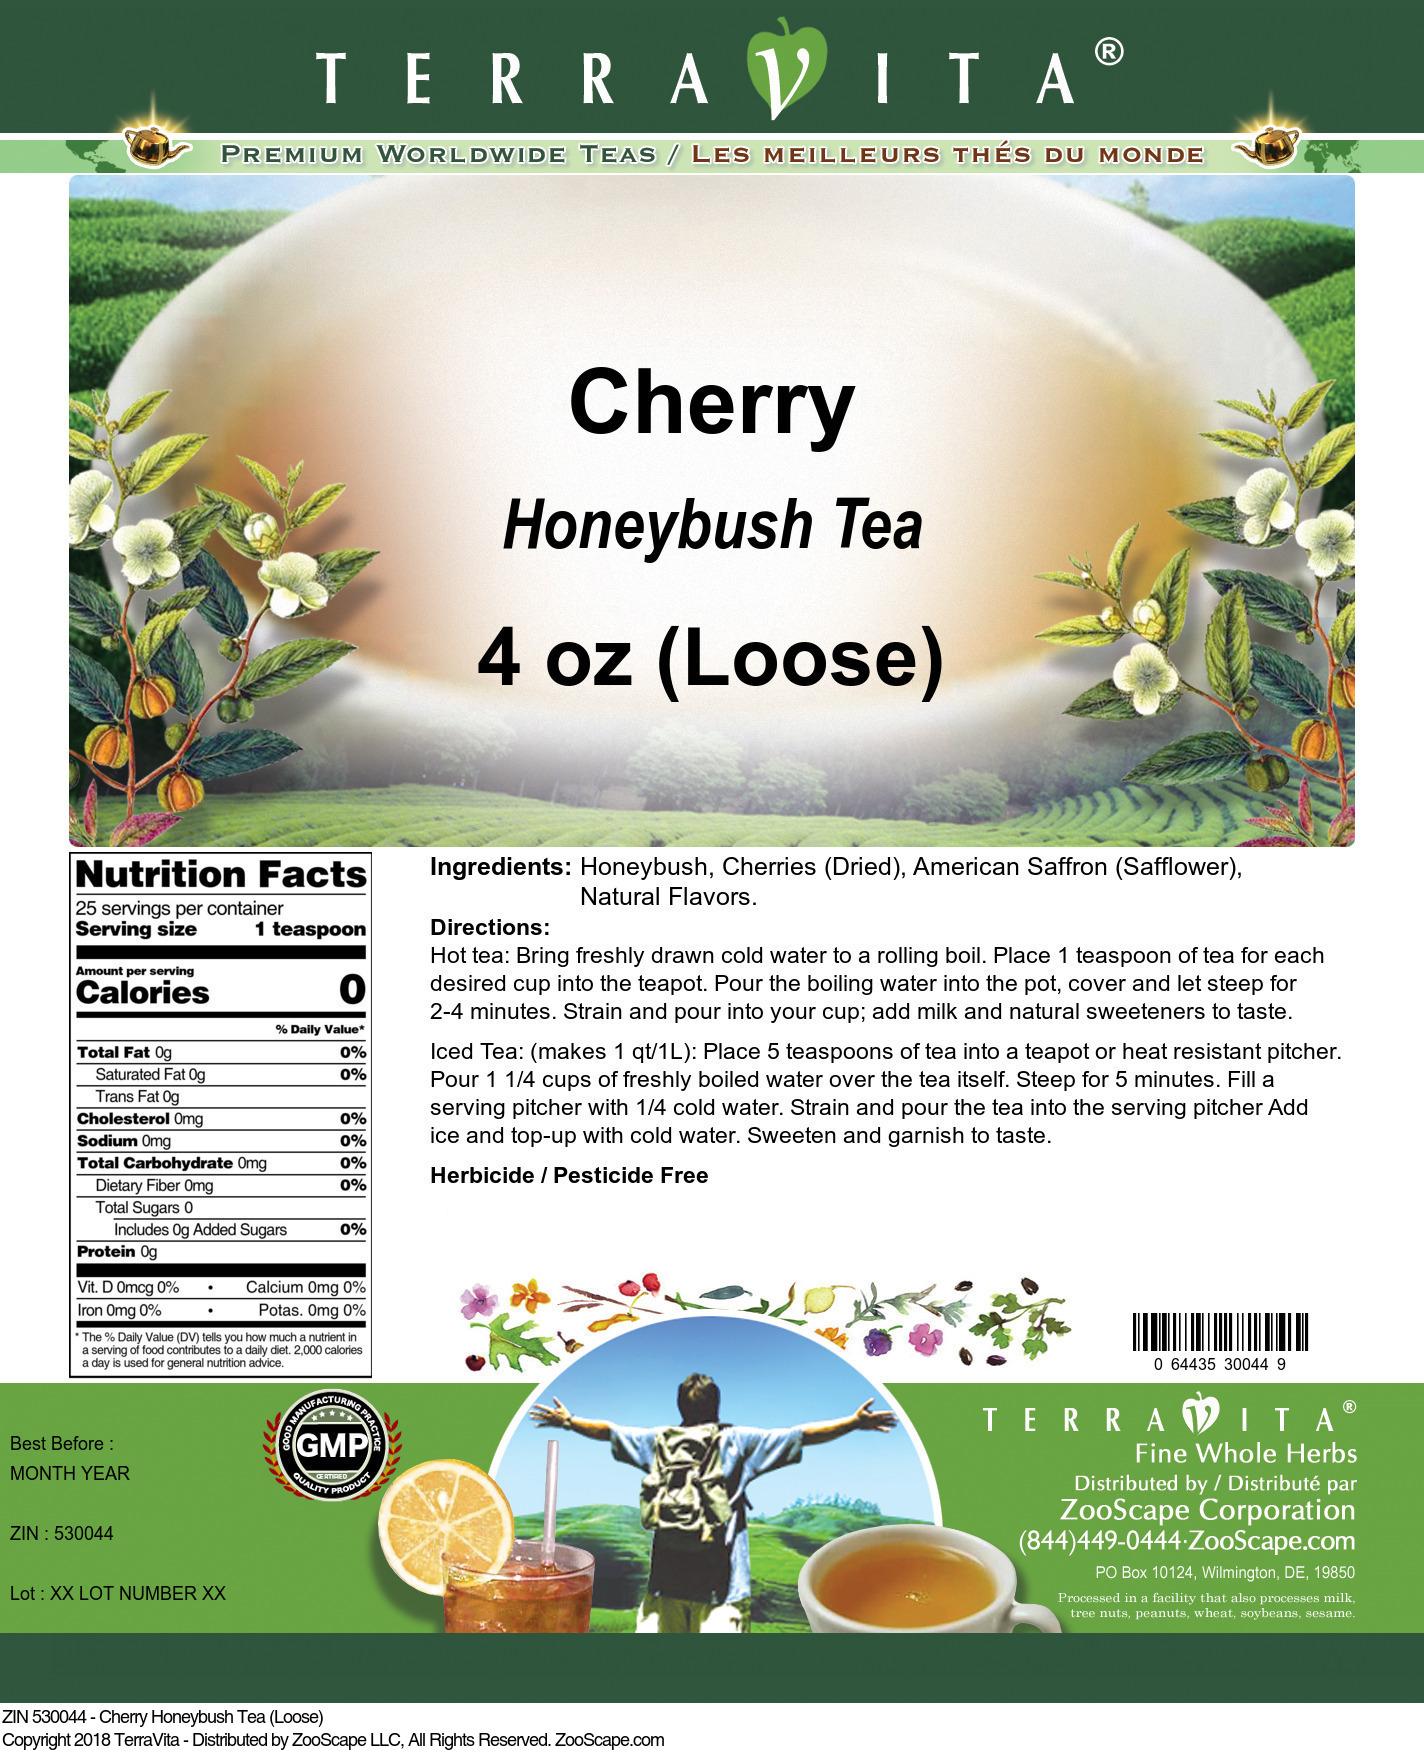 Cherry Honeybush Tea